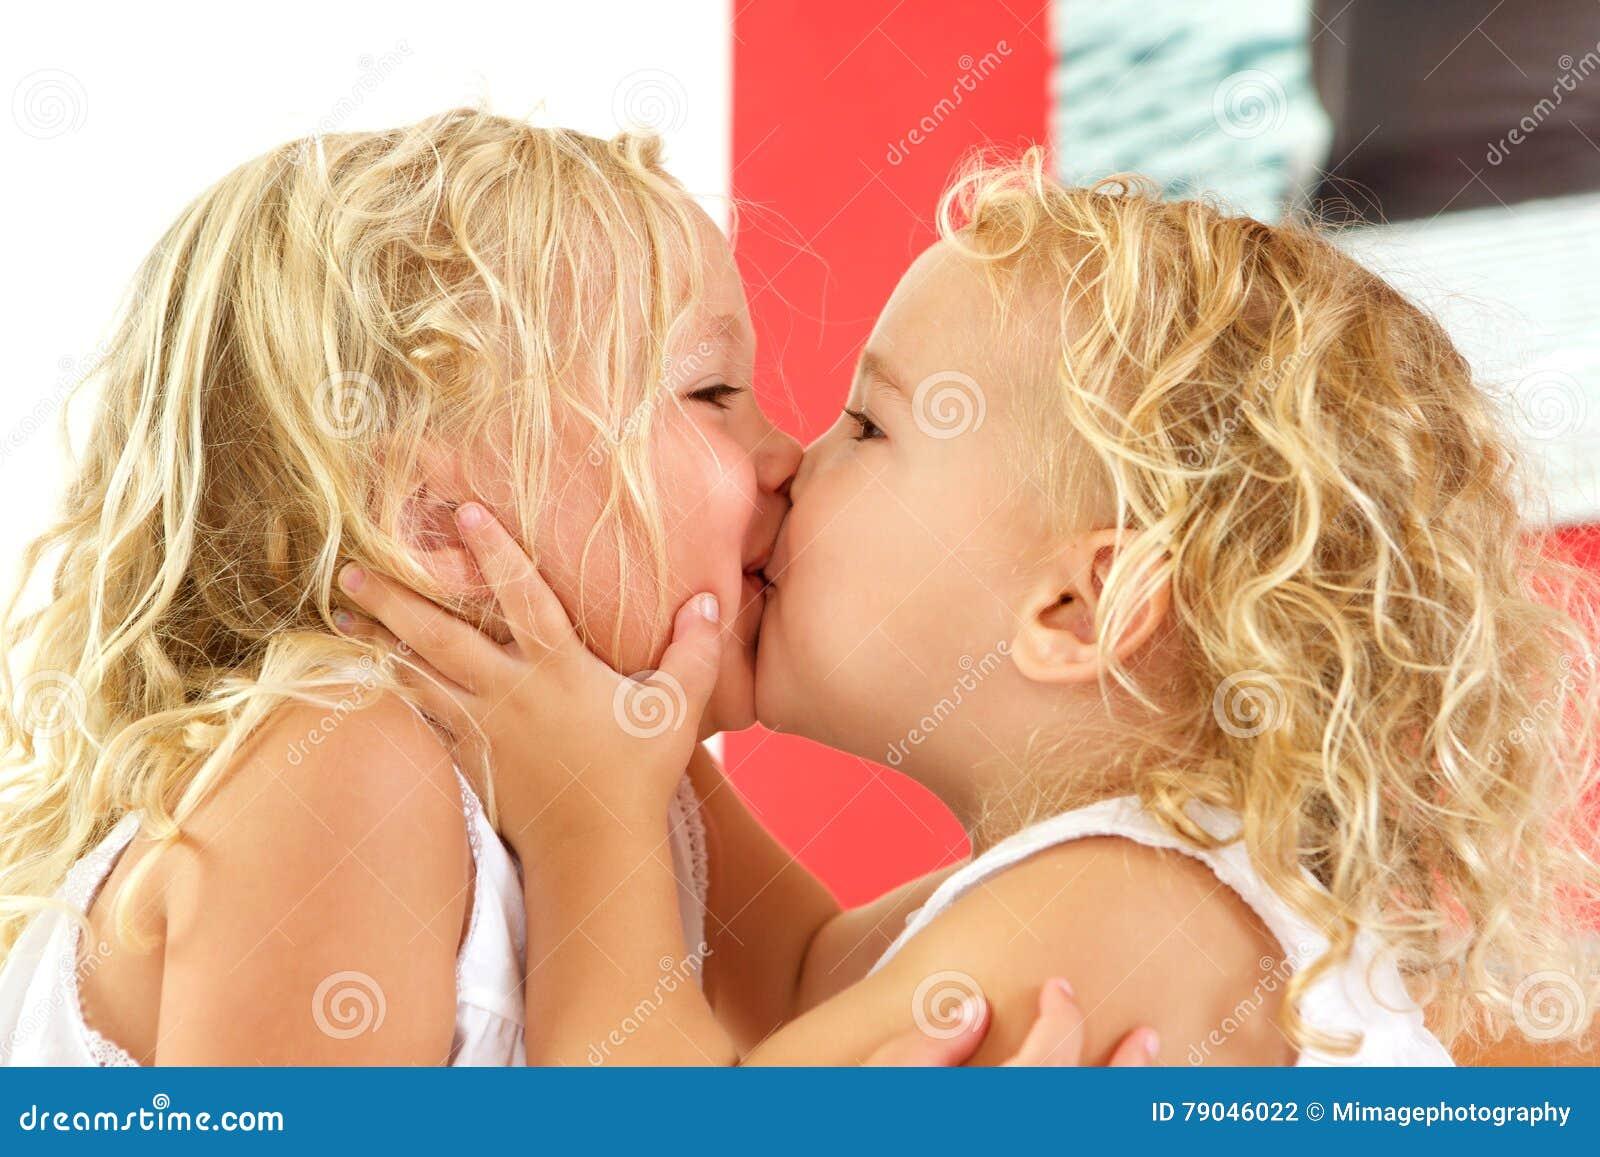 Girls Undressing Each Other